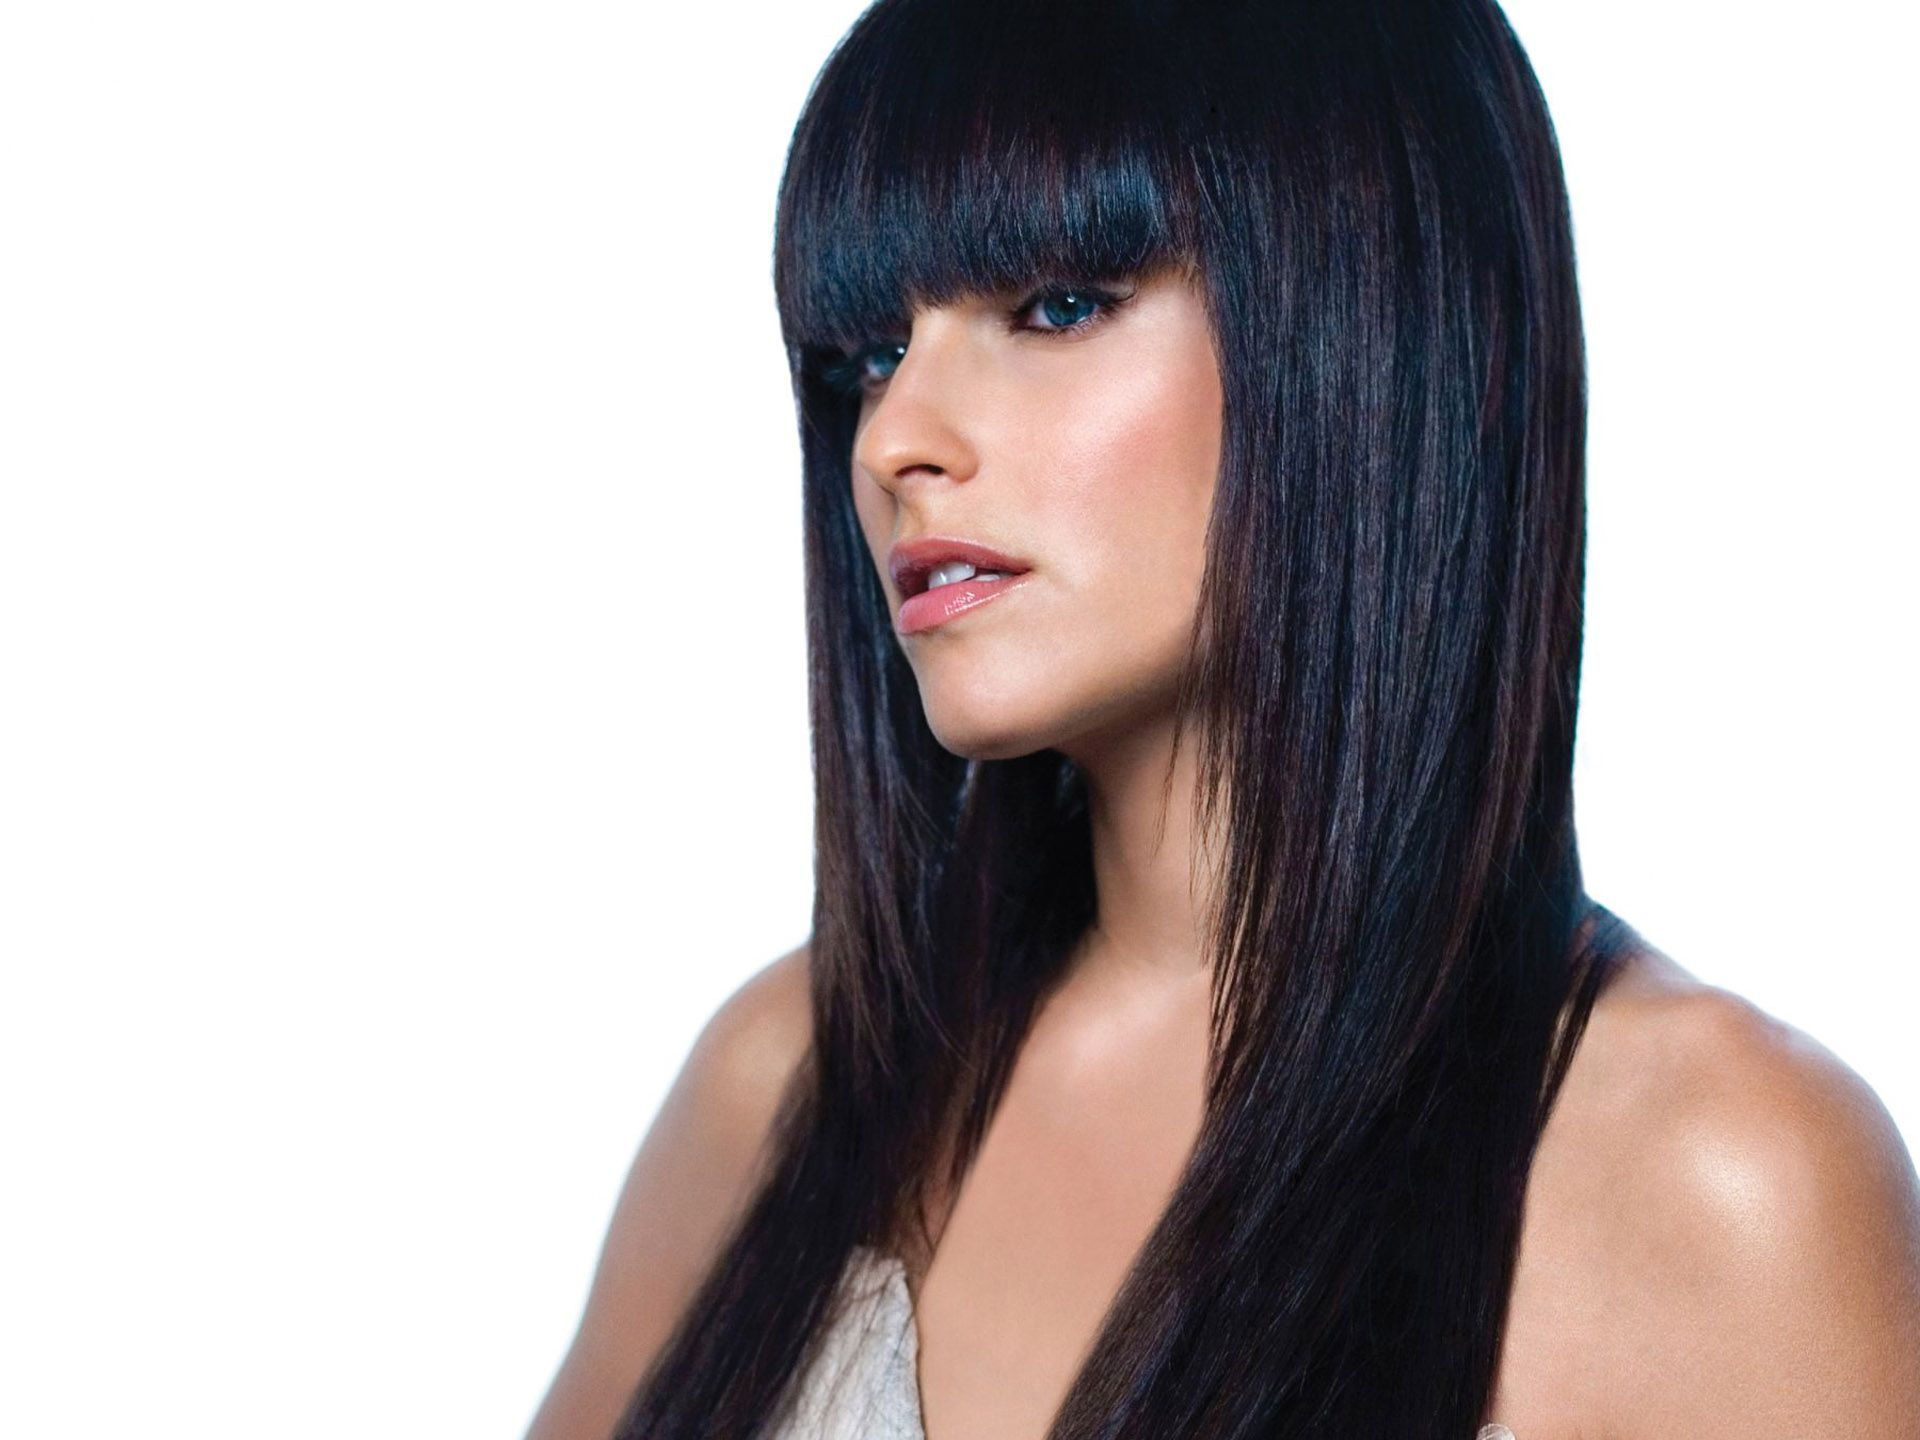 Nelly-Furtado-Hot-Singer-Blue-Black-Hair.jpg (1920×1440